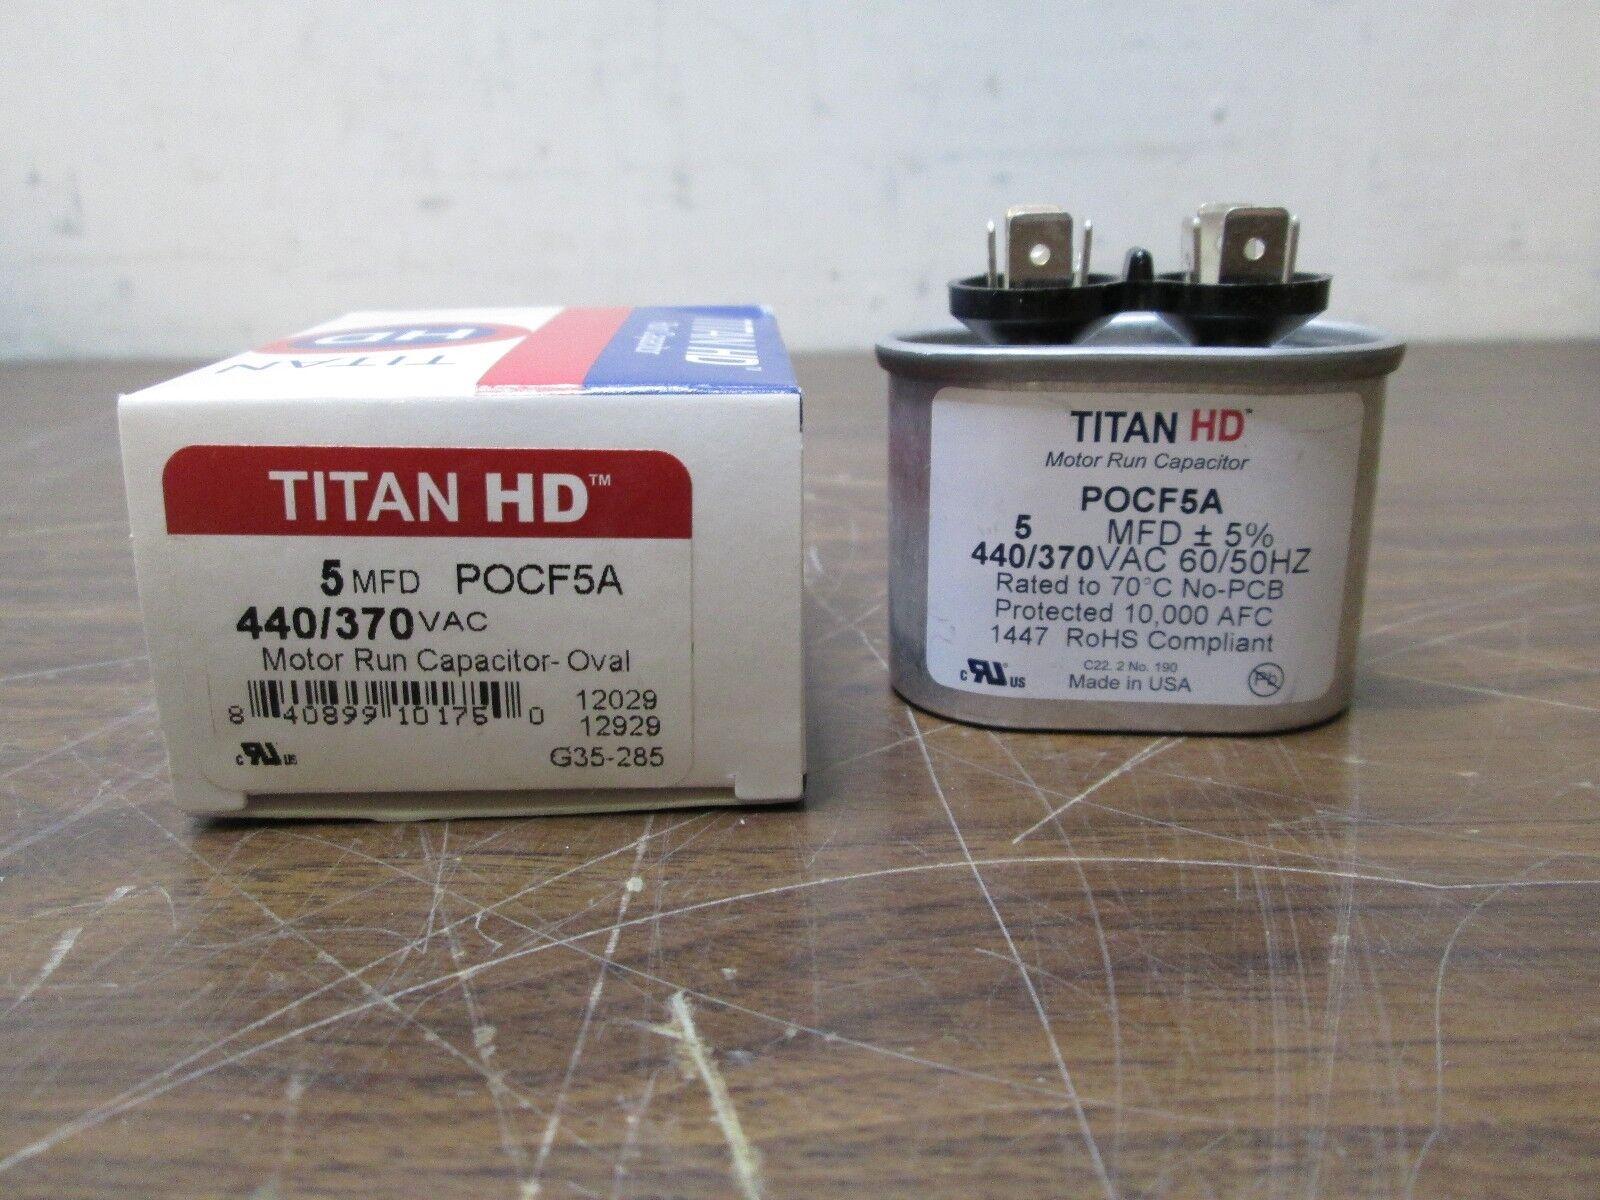 TITAN HD Motor Run Capacitor 5 MFD 440V 50//60Hz Oval POCF5A Free Shipping